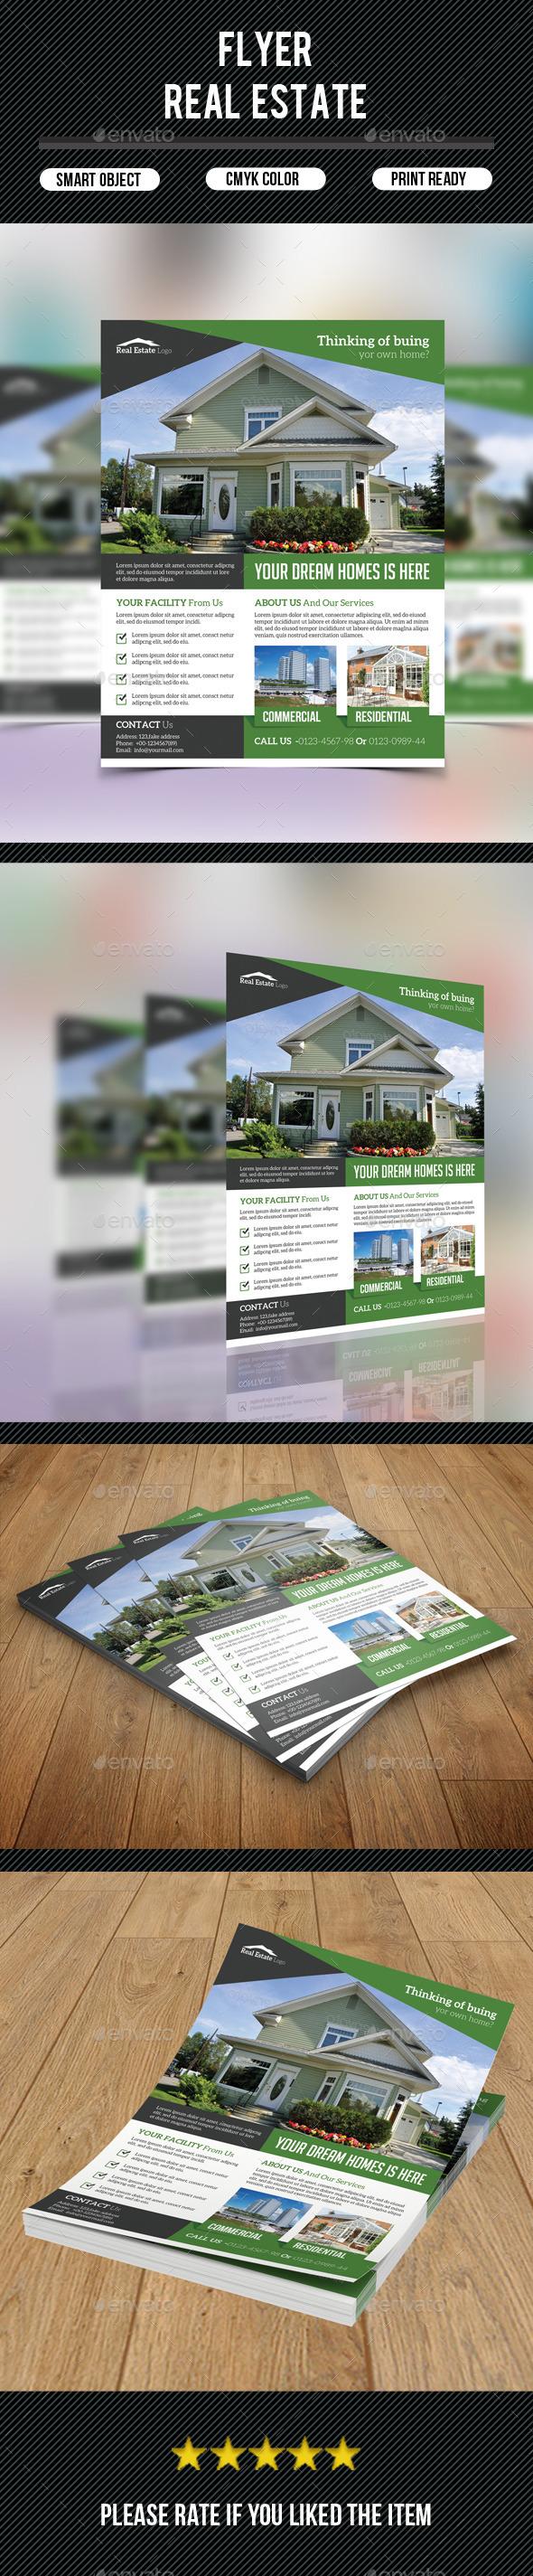 GraphicRiver Real Estate Flyer 9571967